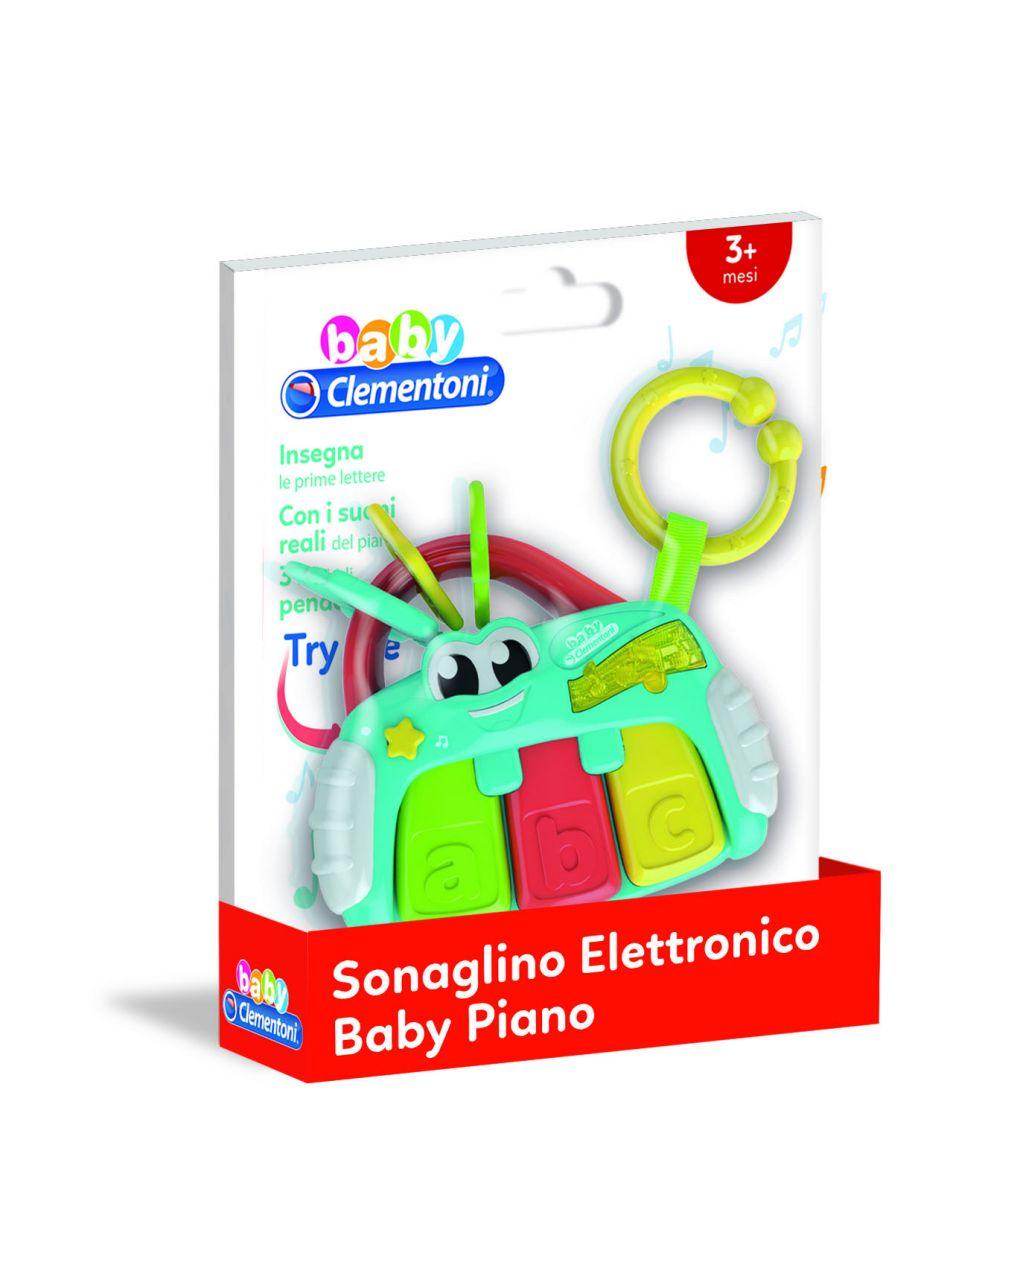 Baby clementoni - sonaglino elettronico baby pianola - Clementoni